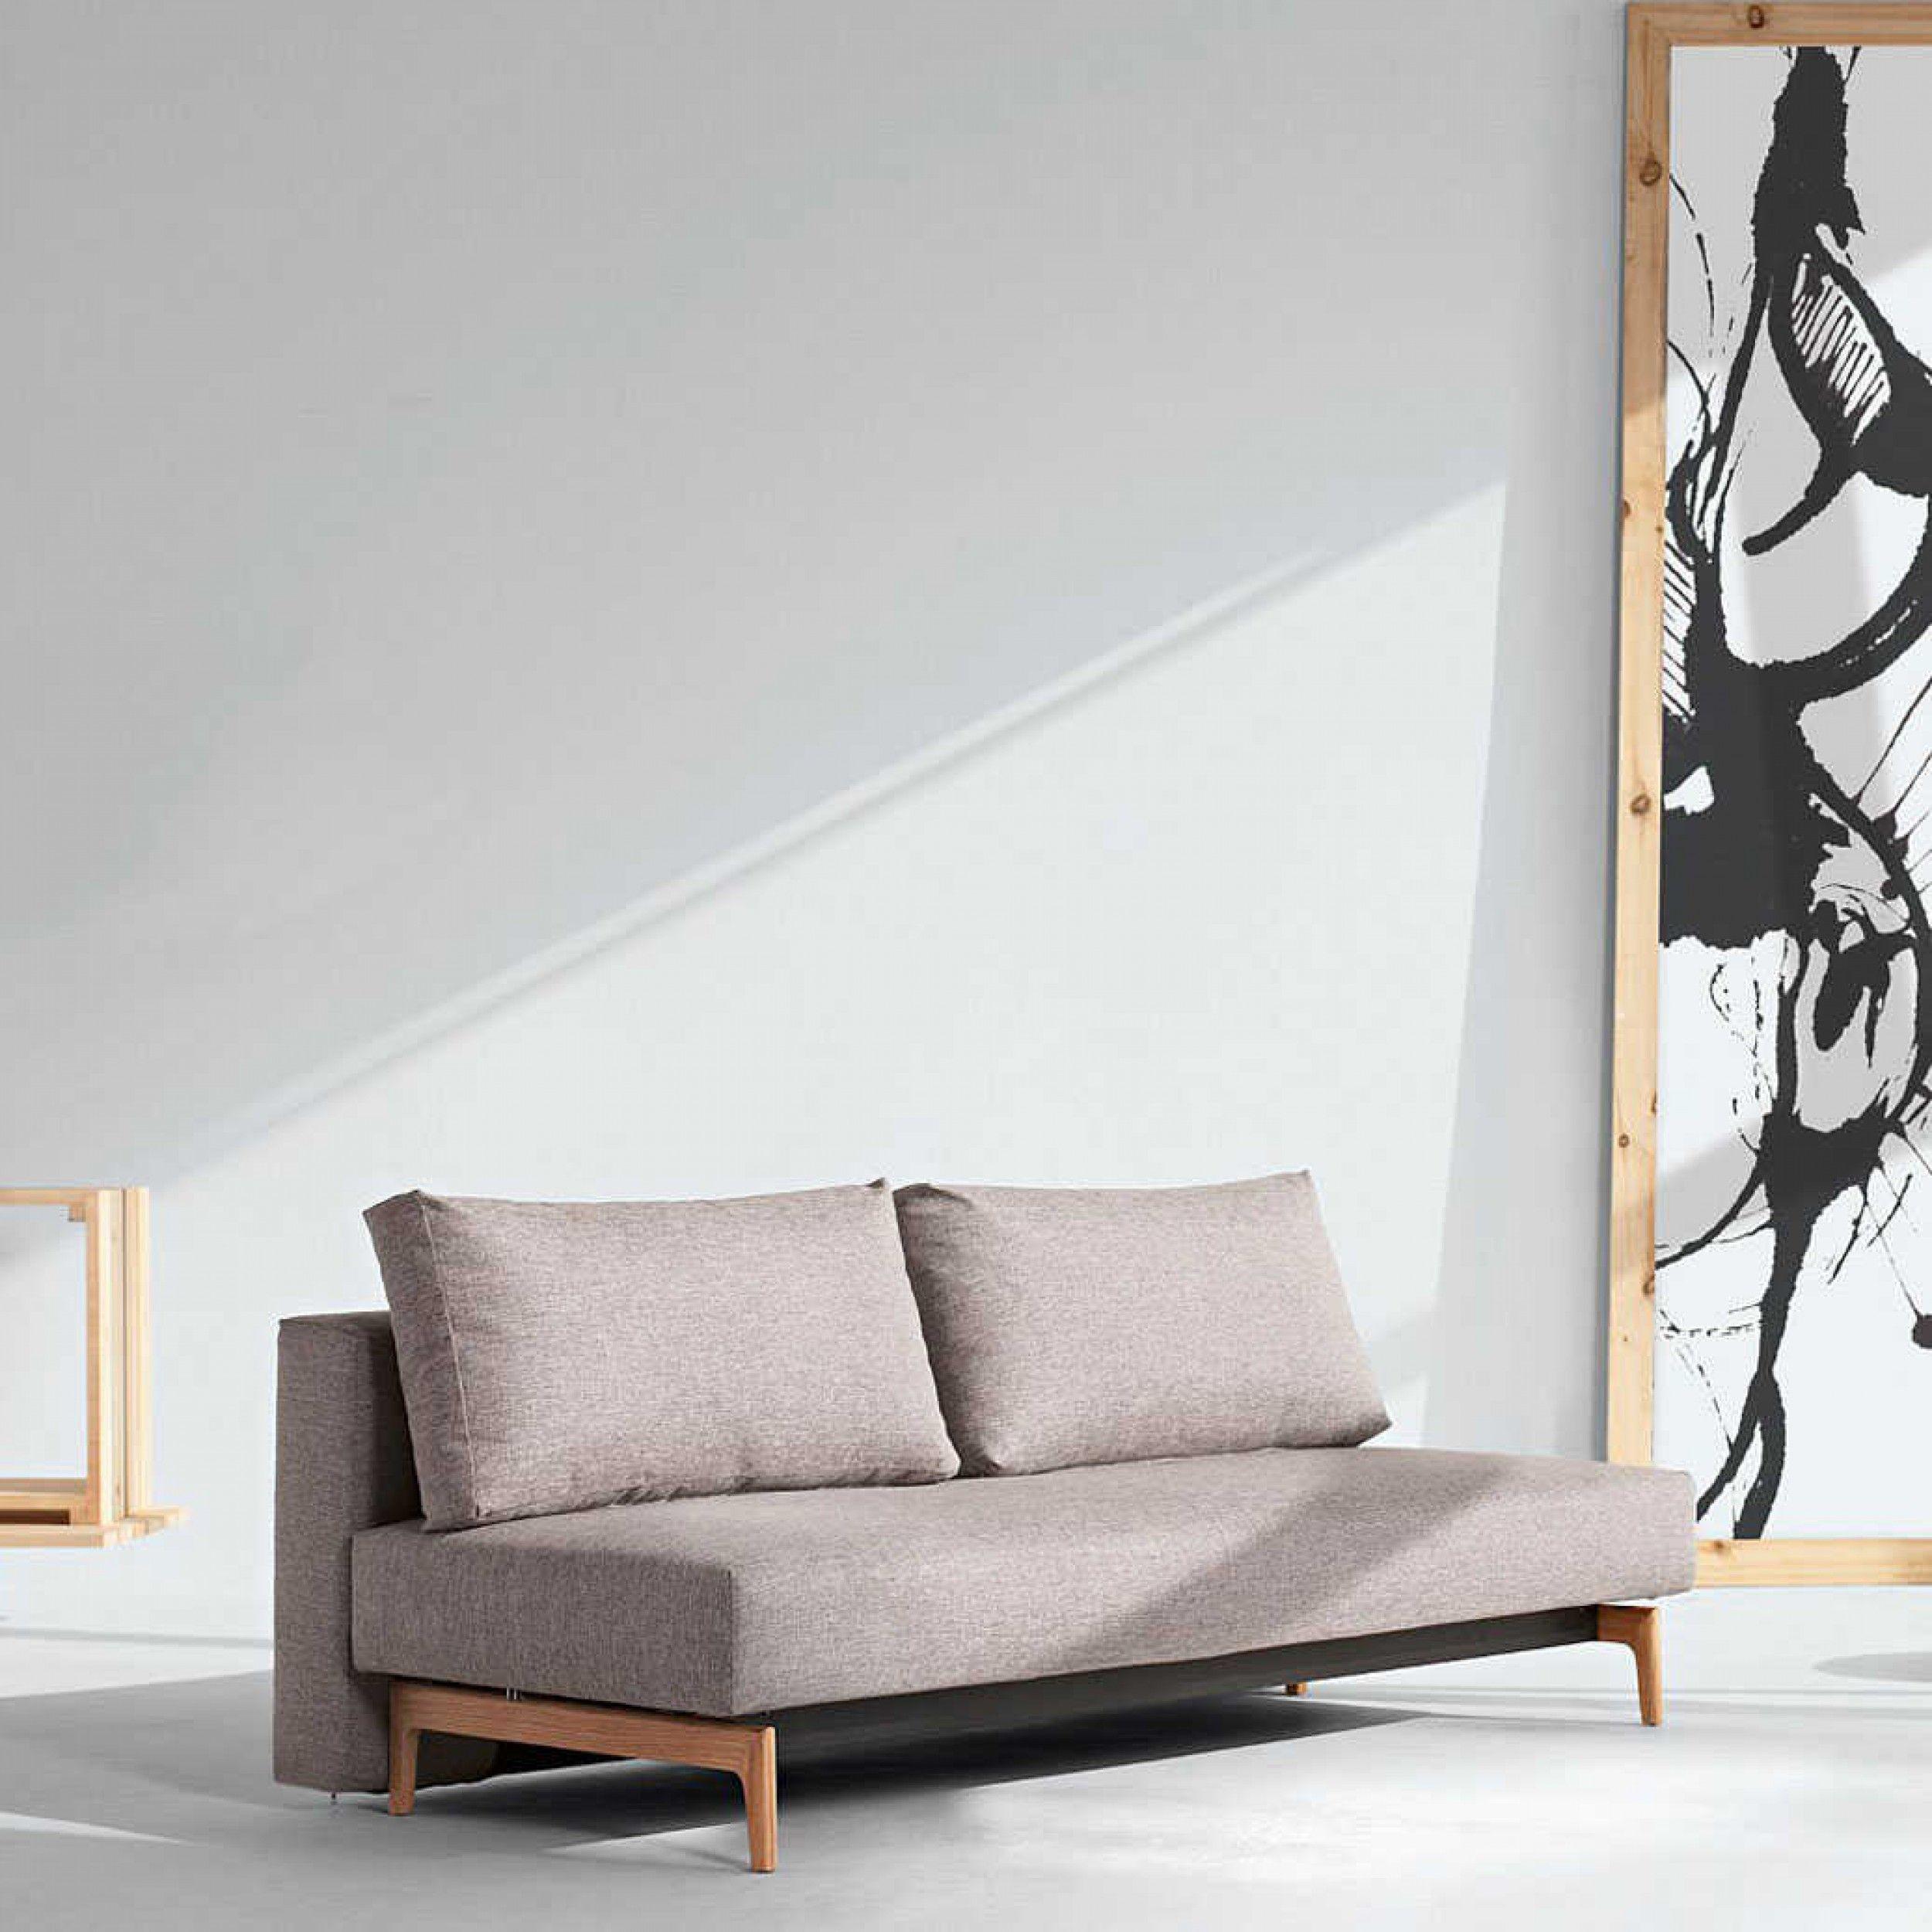 schlafsofa trym grau schlafzimmer bedrooms. Black Bedroom Furniture Sets. Home Design Ideas